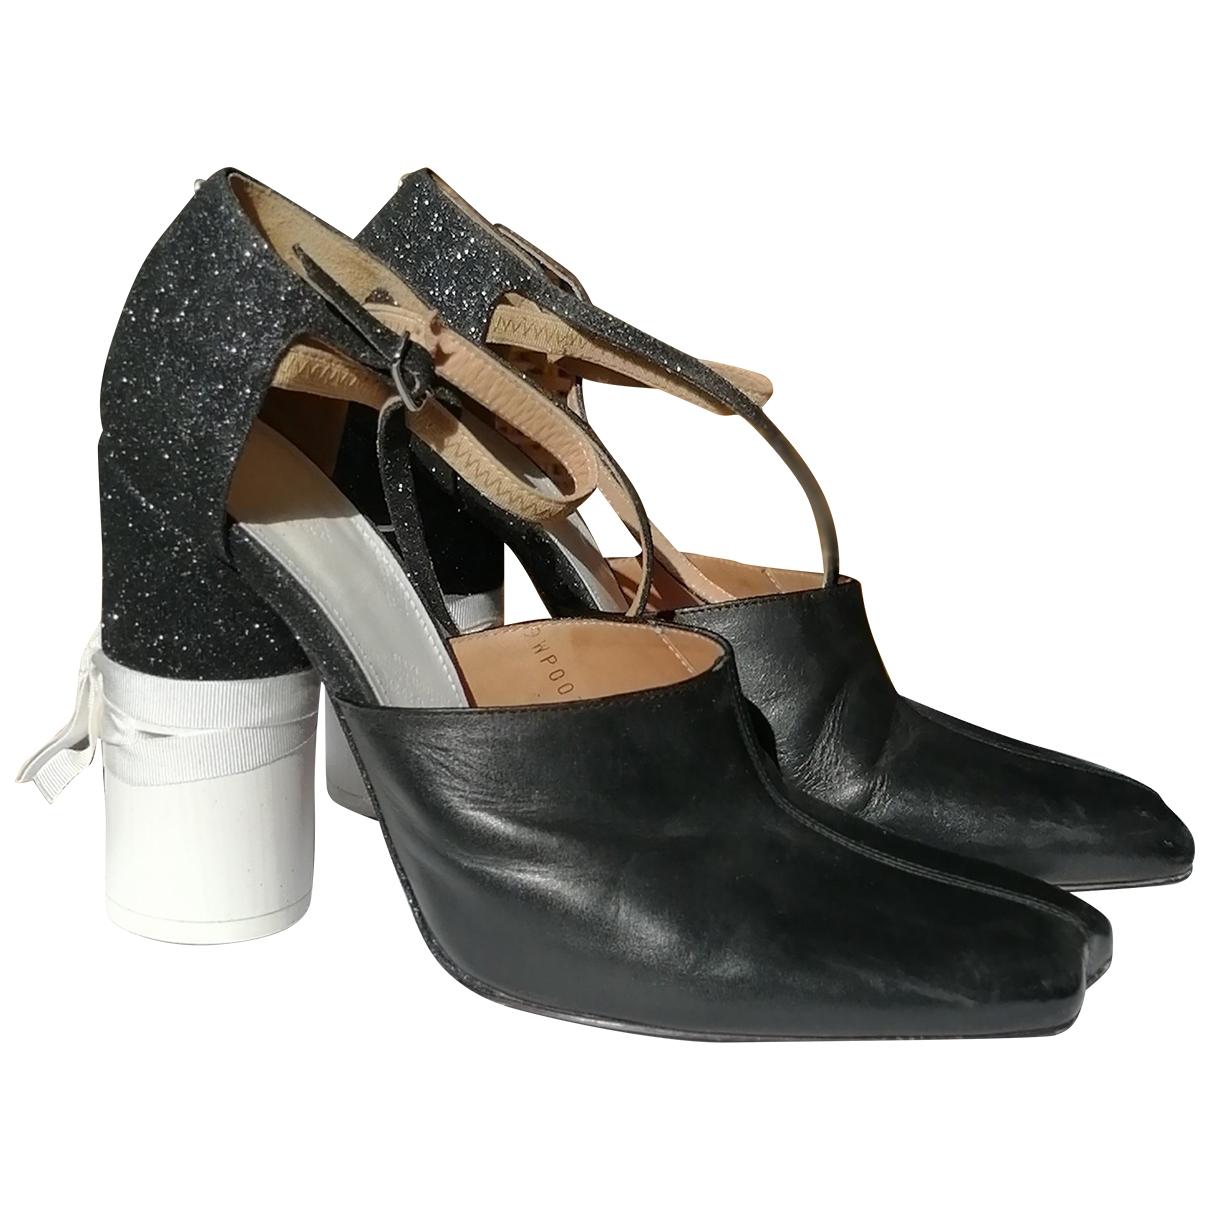 Maison Martin Margiela \N Black Leather Heels for Women 38 EU